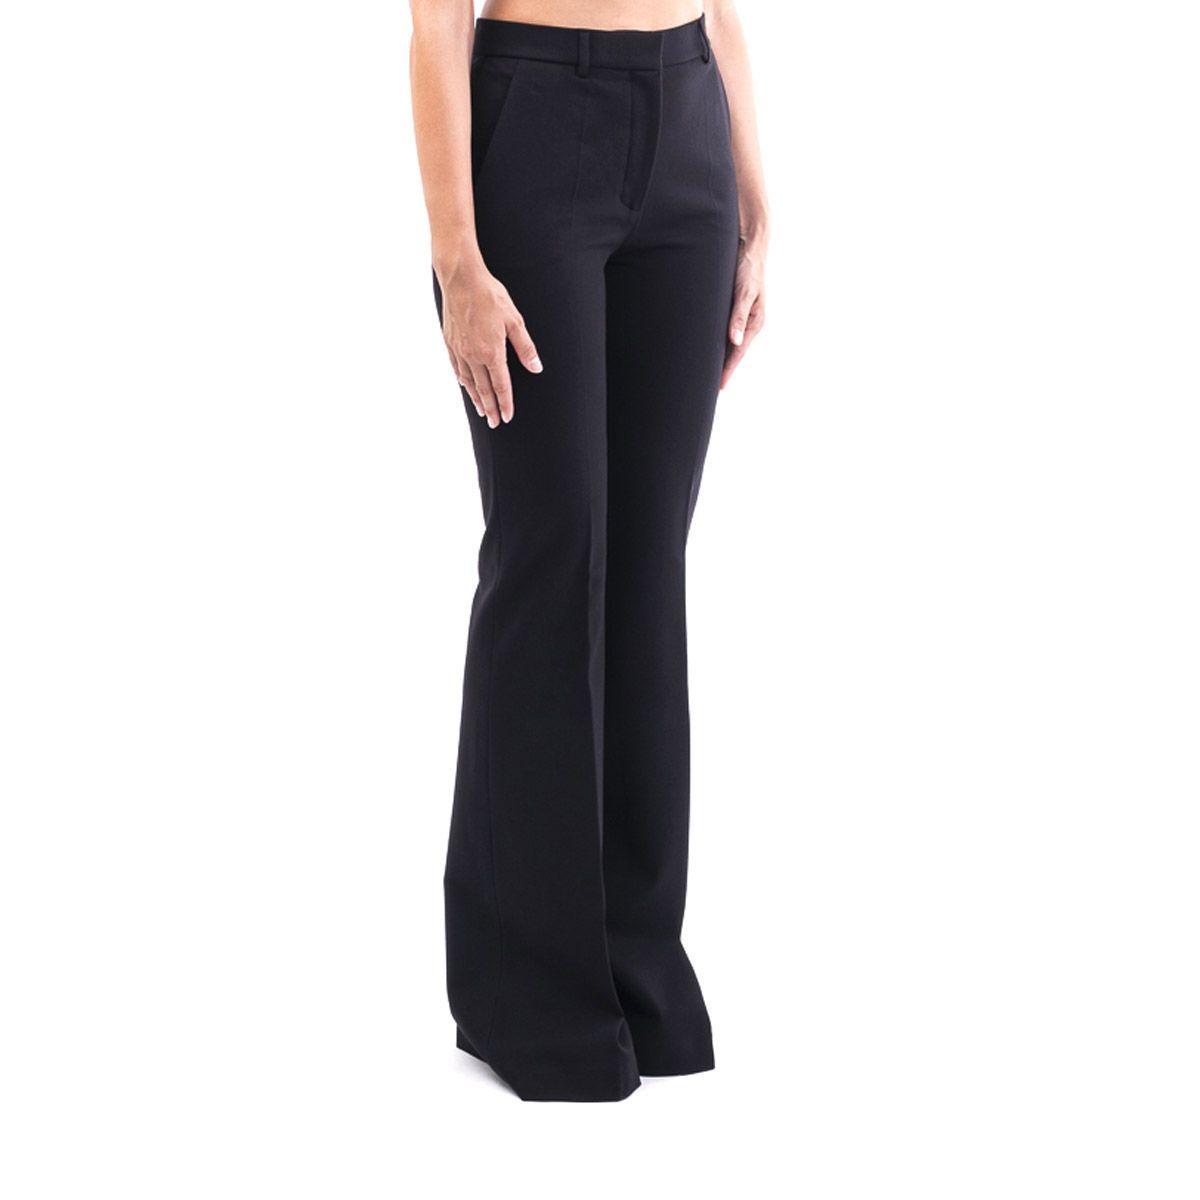 ALBERTA FERRETTI WOMEN'S A03036621555 BLACK COTTON PANTS